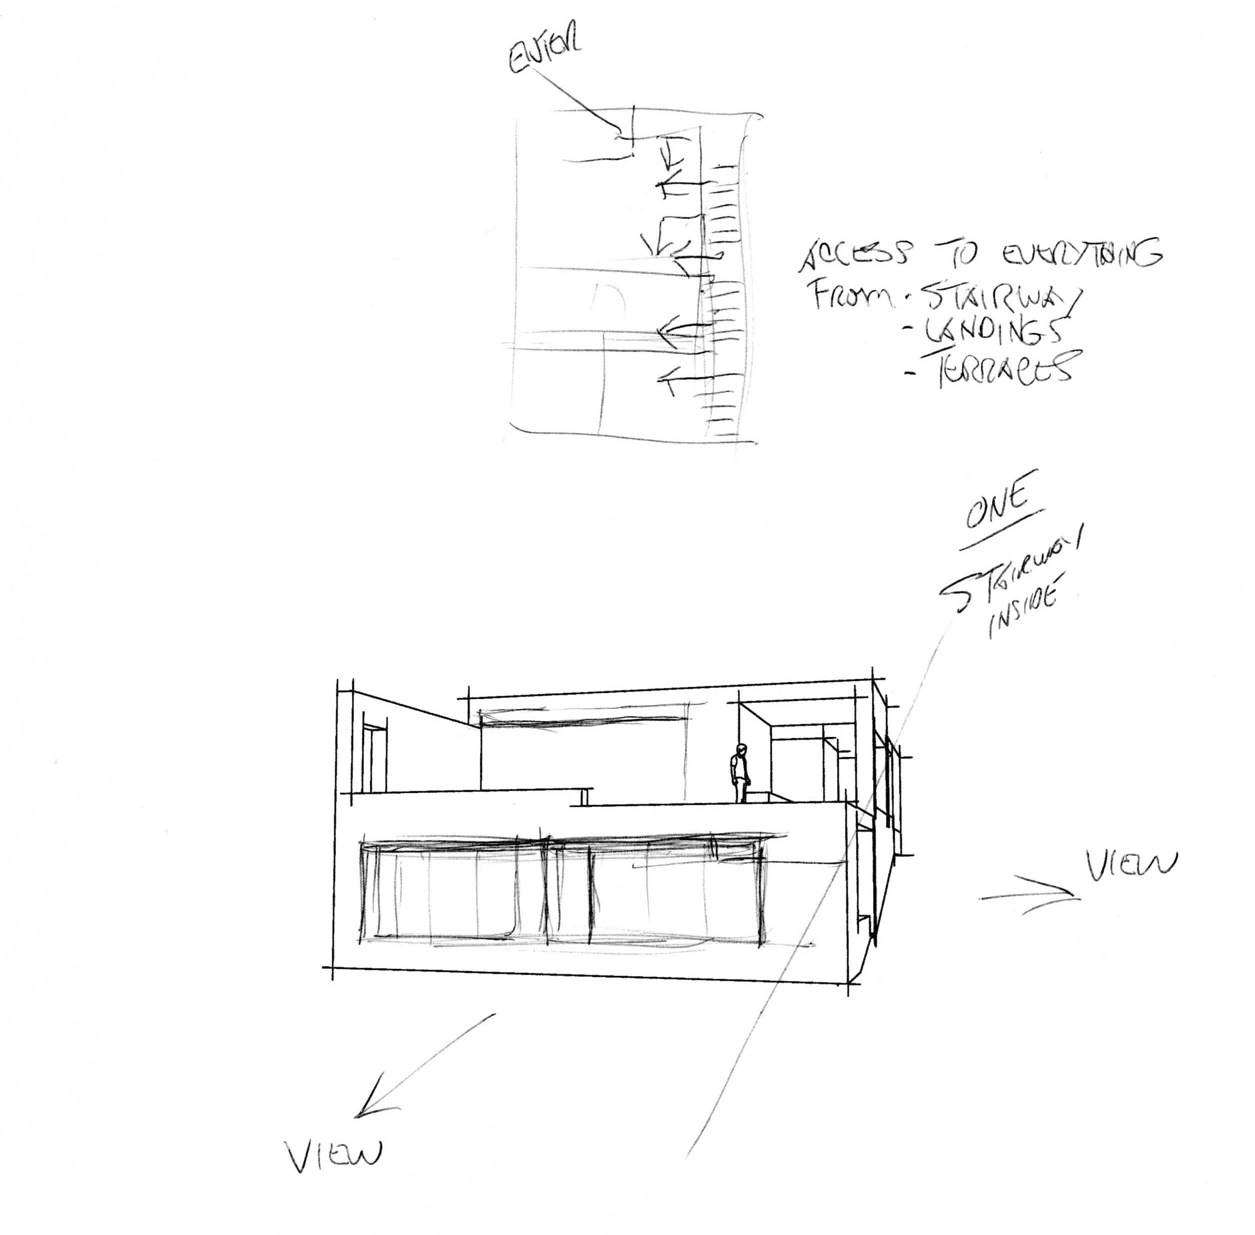 Designing a Beach House